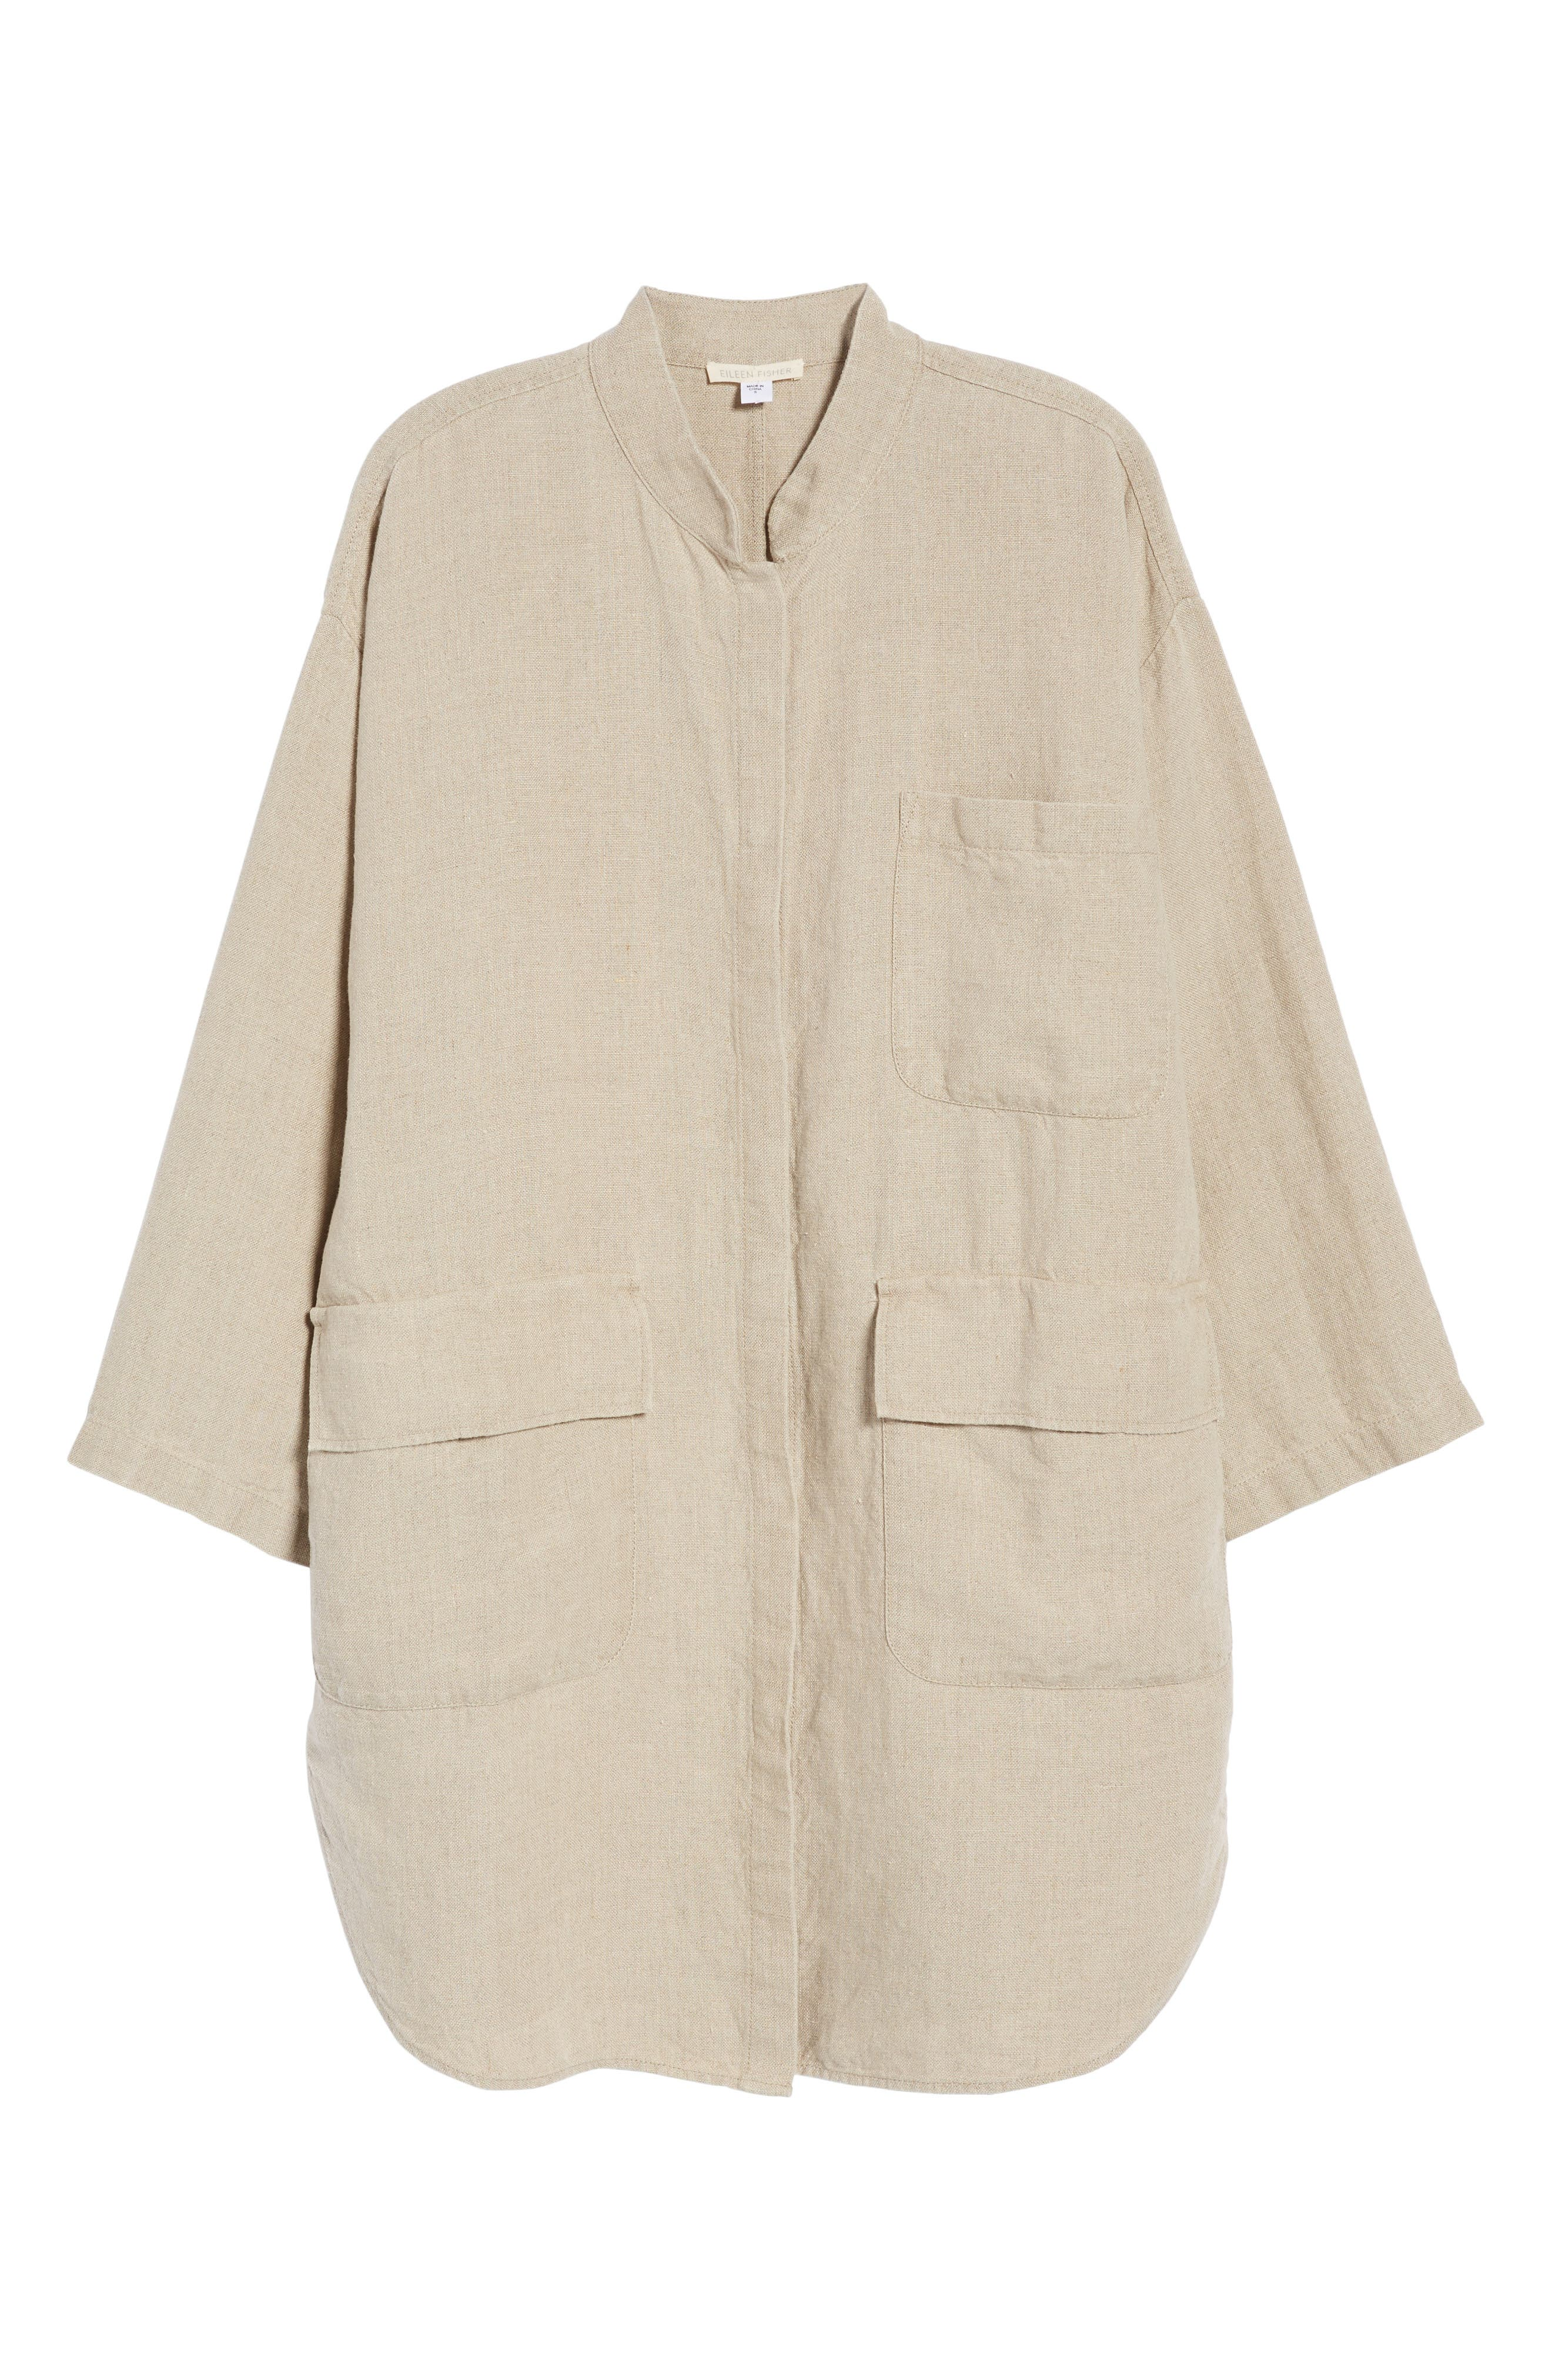 Organic Linen Jacket,                             Alternate thumbnail 7, color,                             Undyed Natural